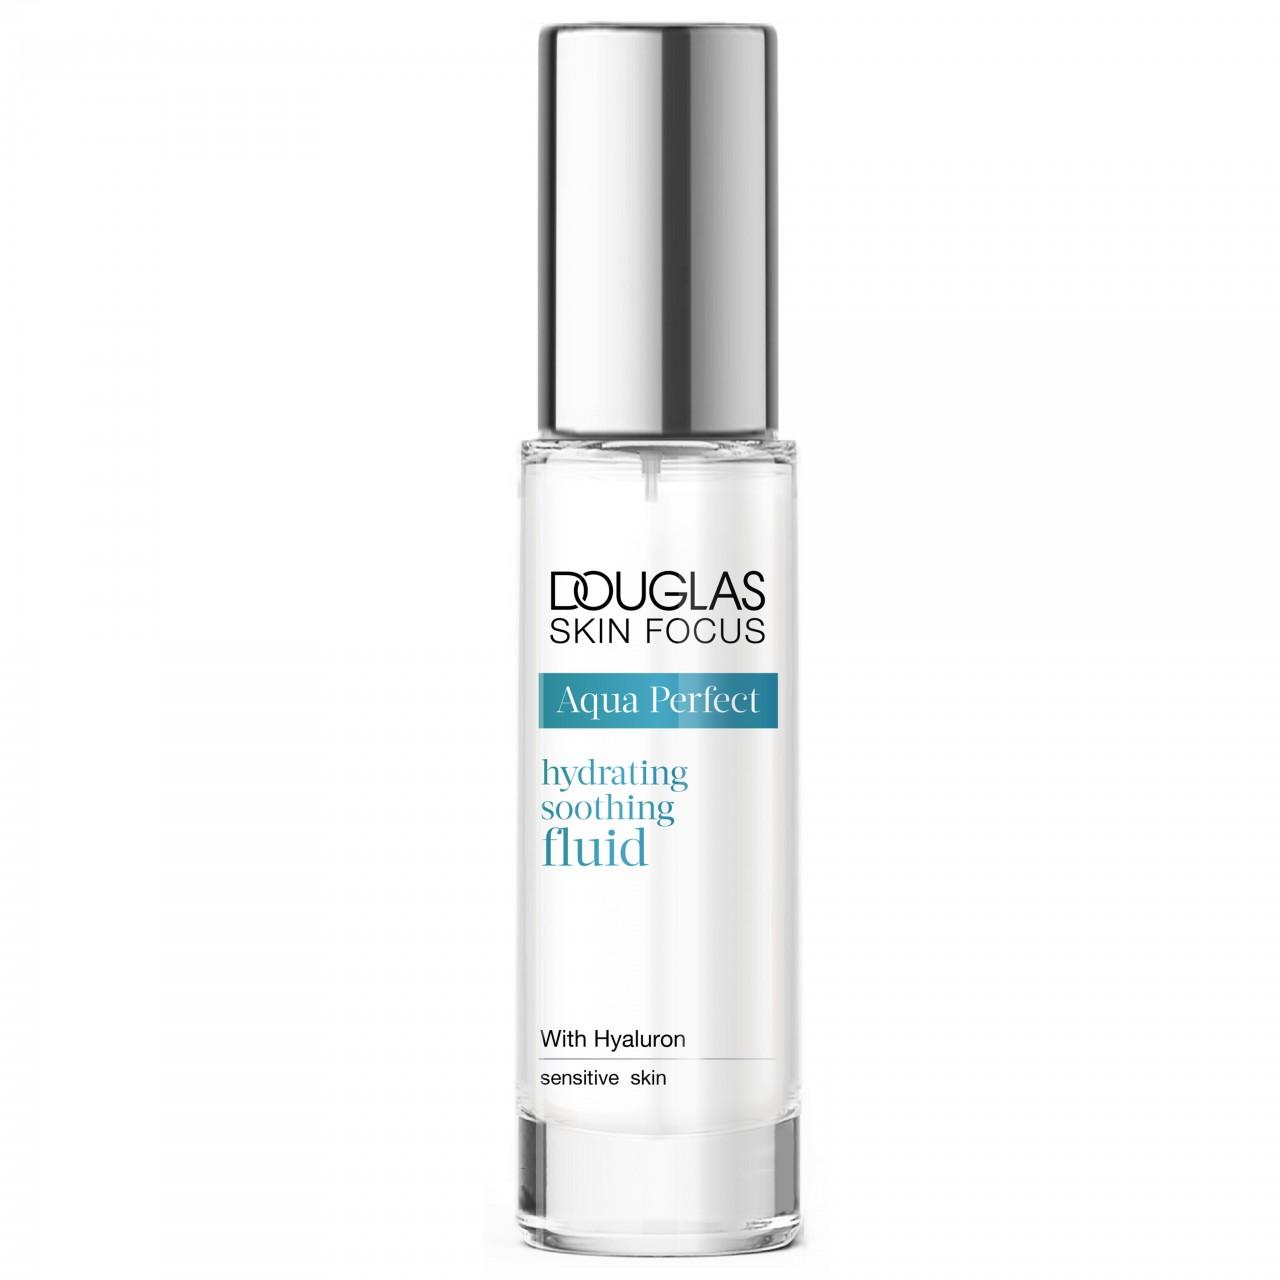 Douglas Focus Hydrating Soothing Fluid